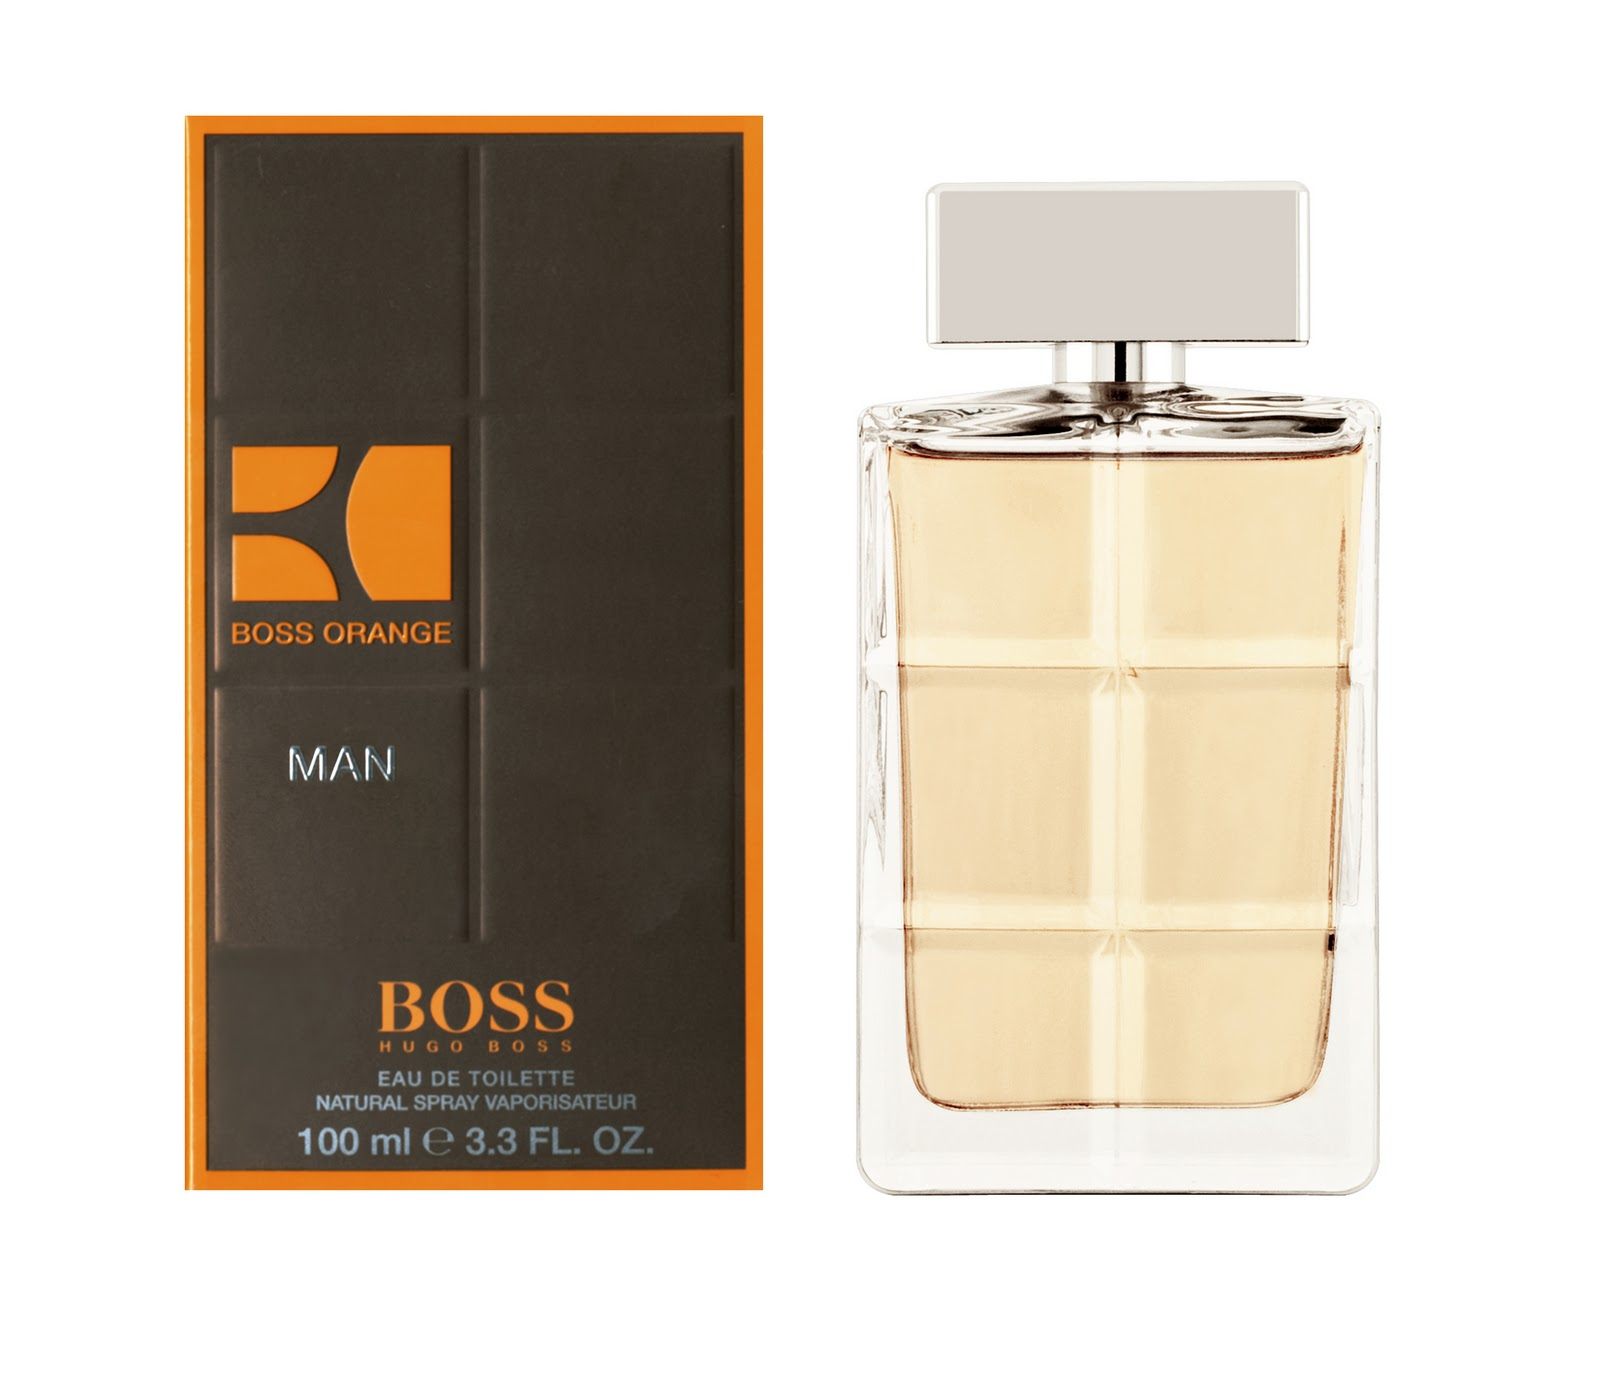 New Boss Orange Man By Hugo Boss Perfume Full Size Retail